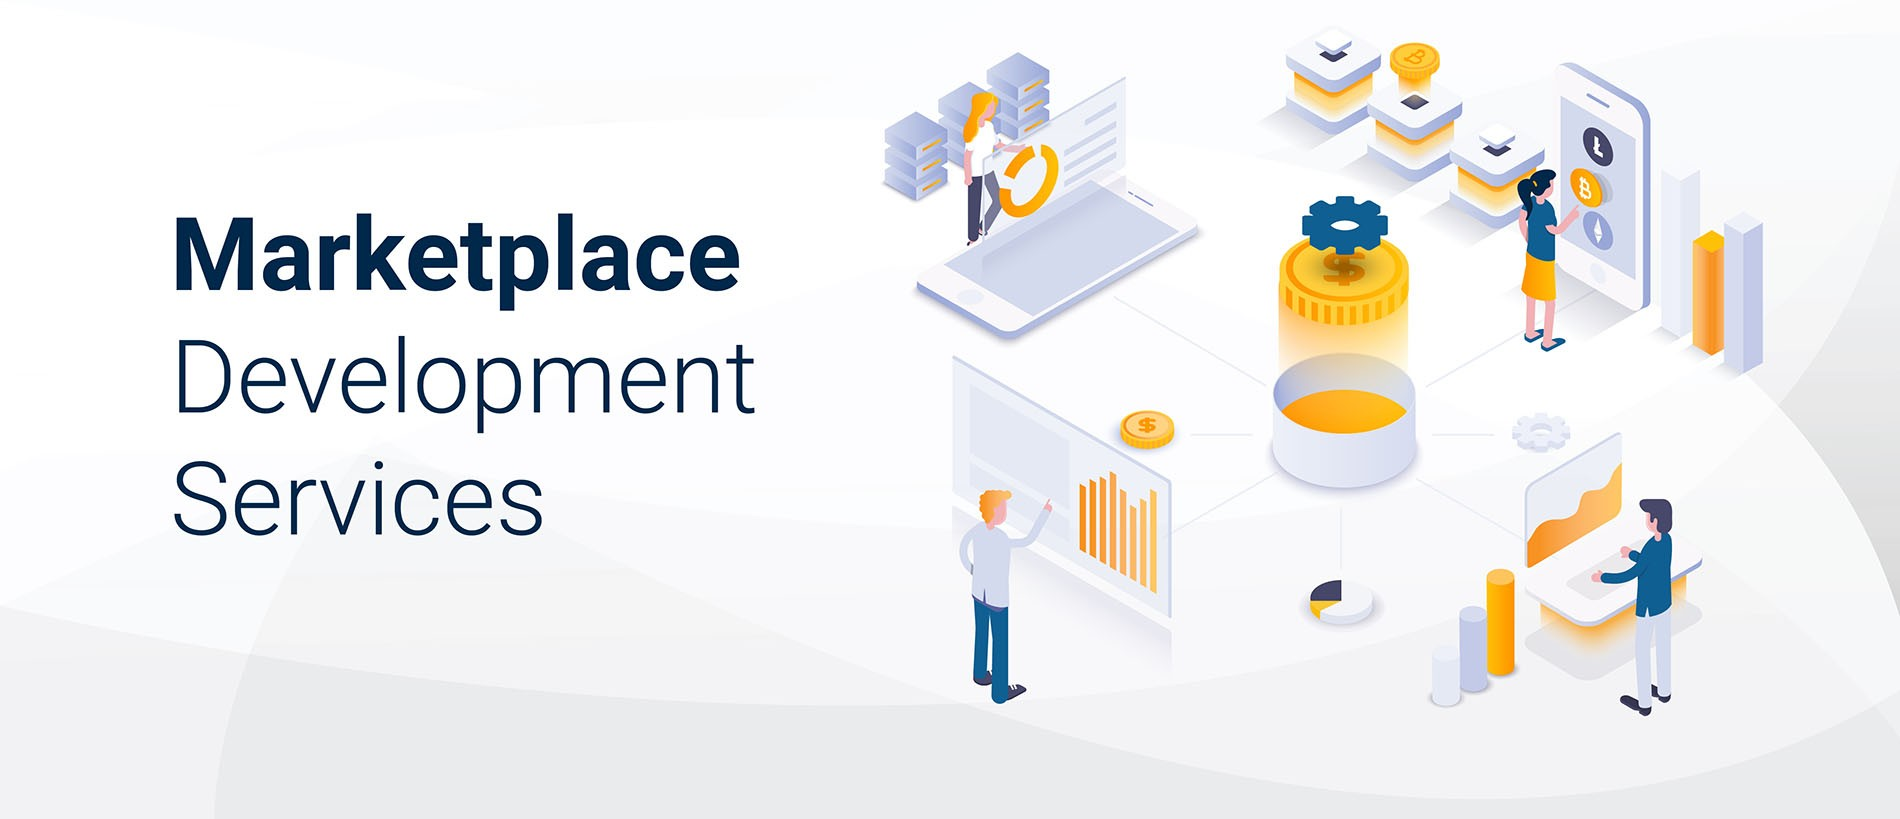 Marketplace Development Services